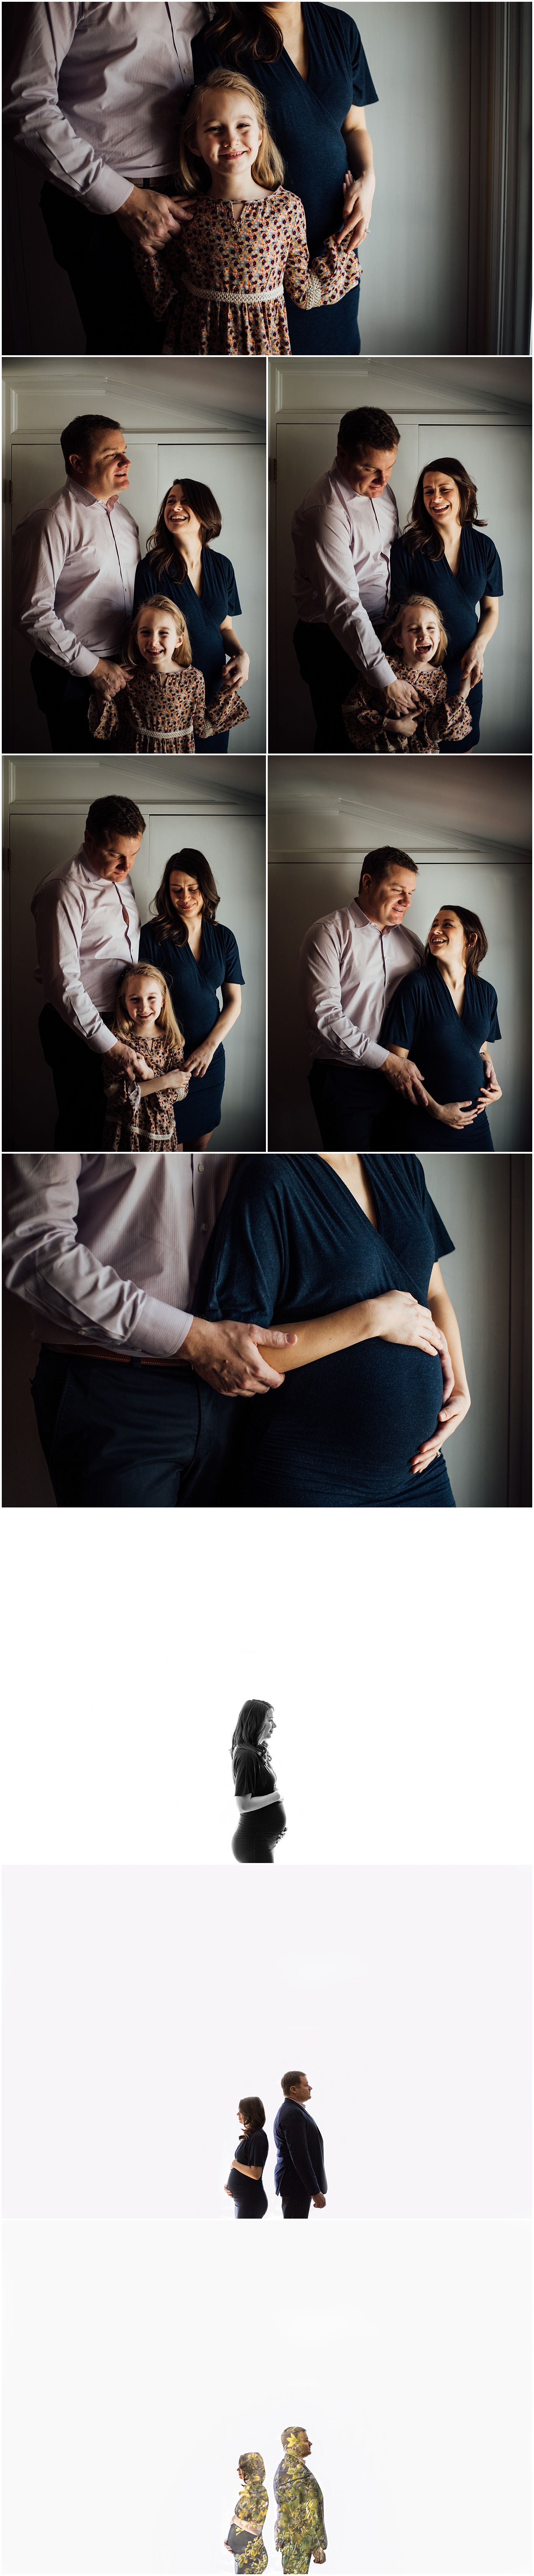 Creative Indoor maternity session by Fairfax Virginia photographer Rachel K Photo